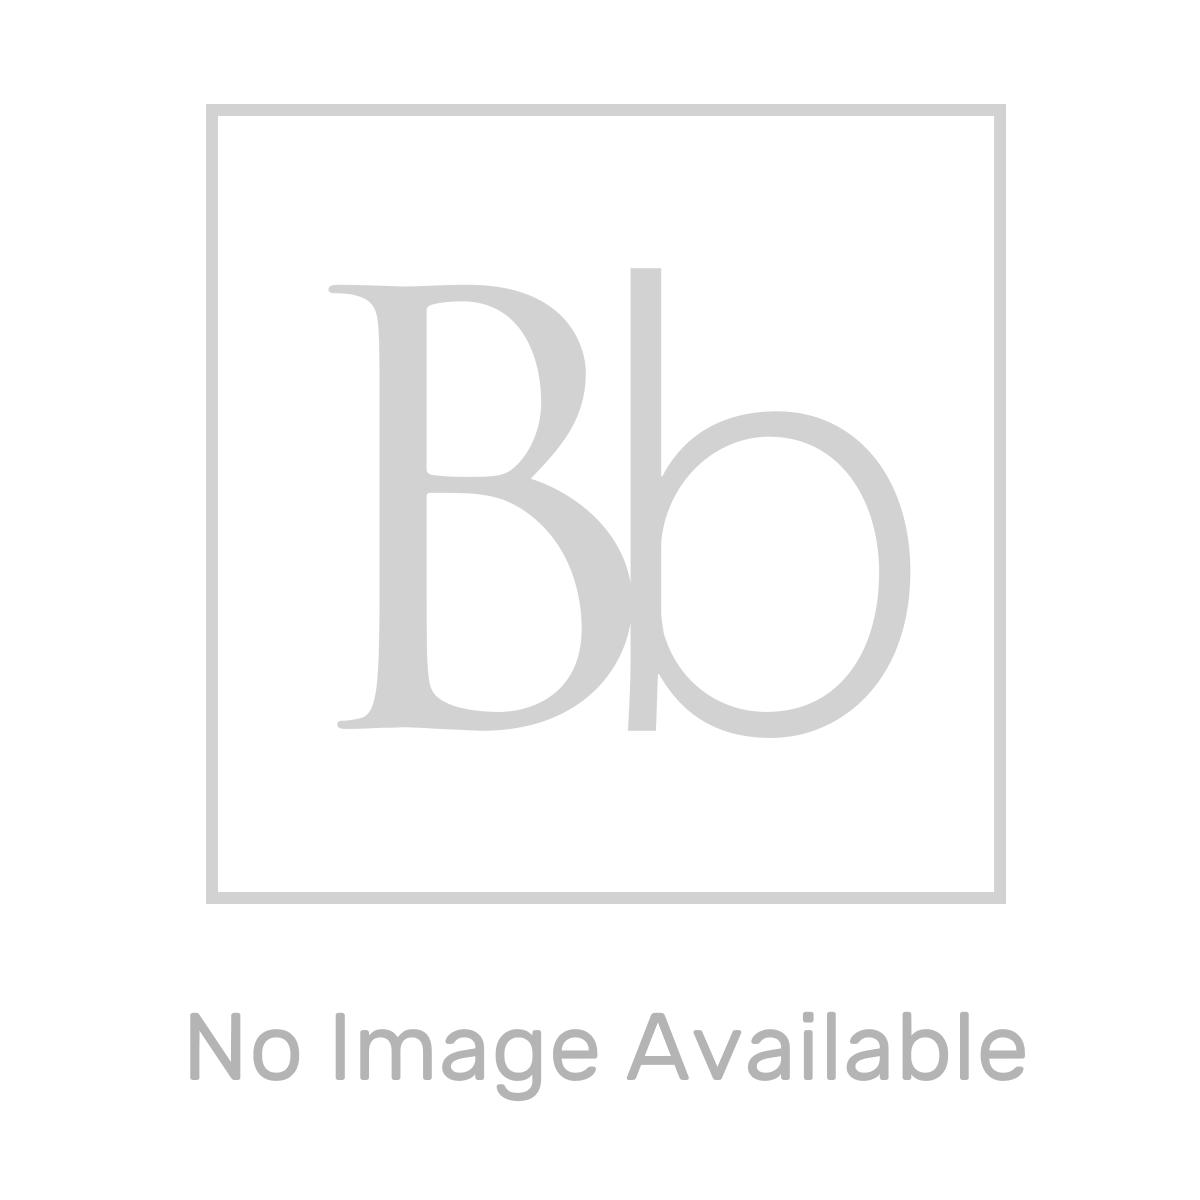 Premier Linton Single Ended Bath 1700 x 700mm Dimensions